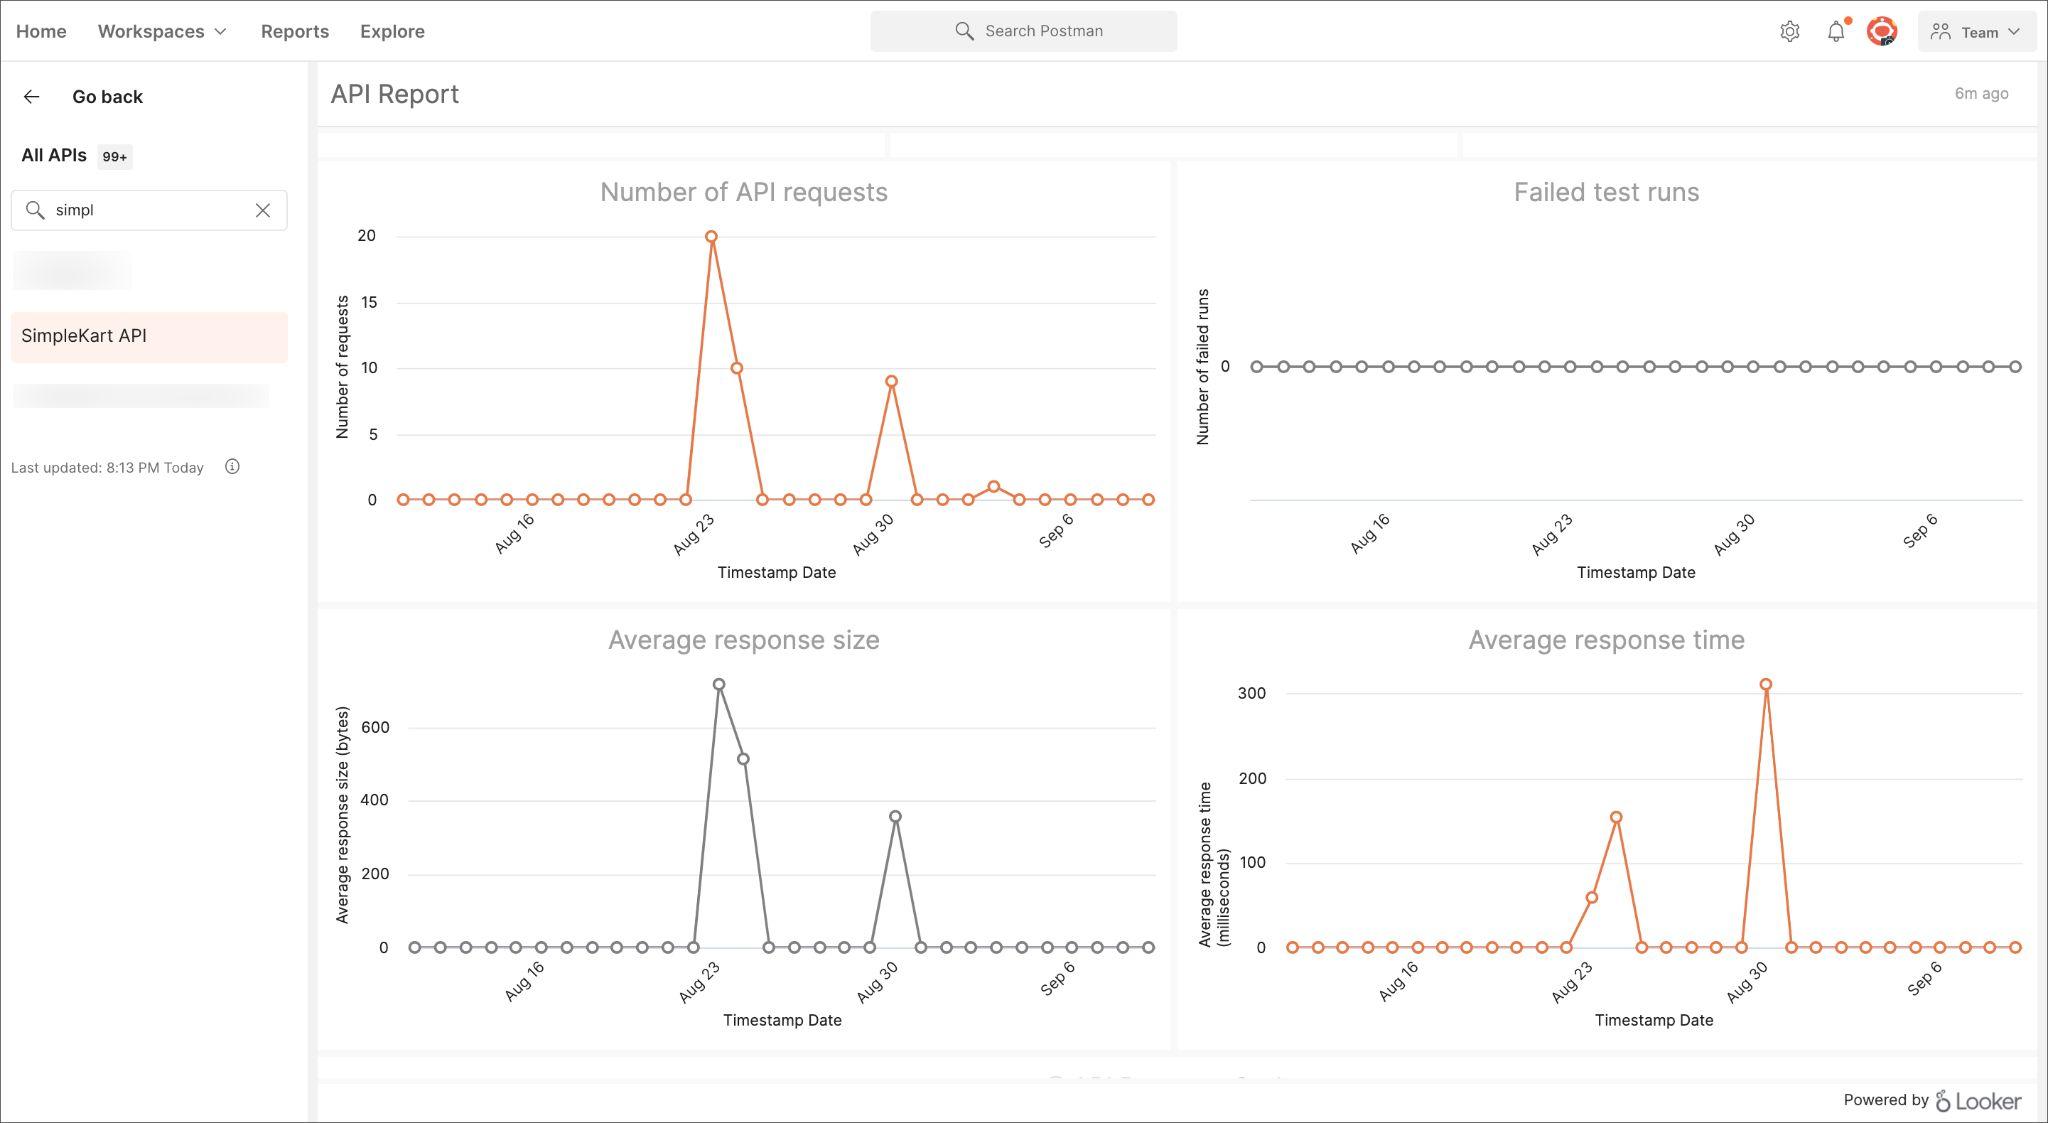 API landscape governance